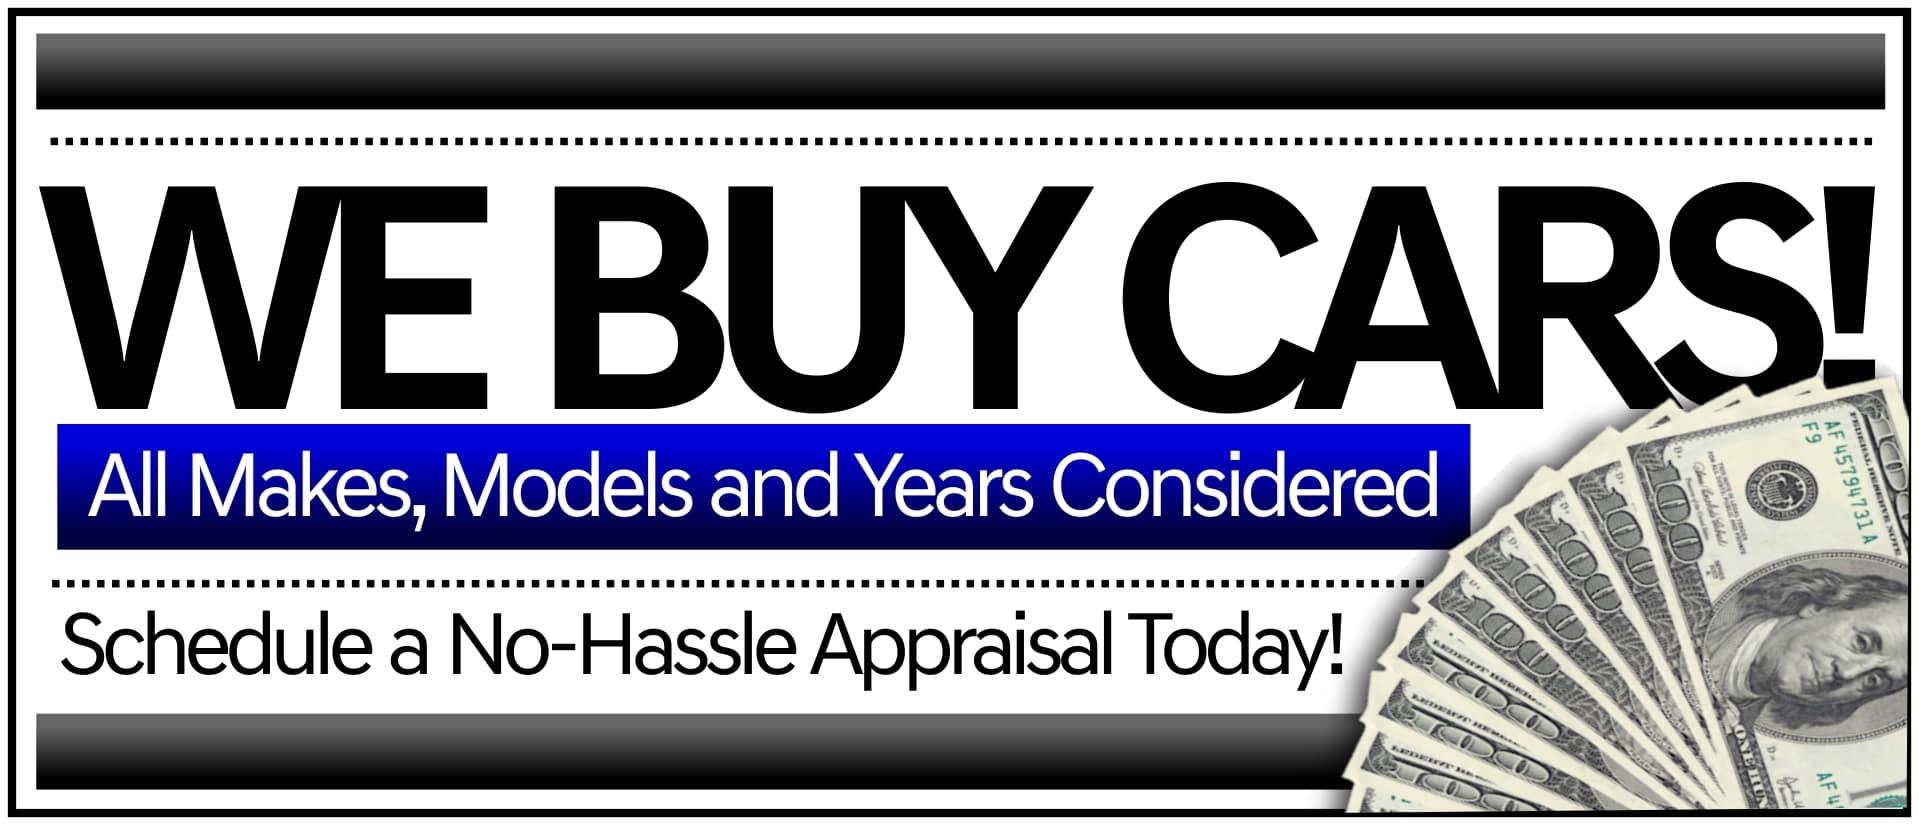 BBN Website Banner – We Buy Cars